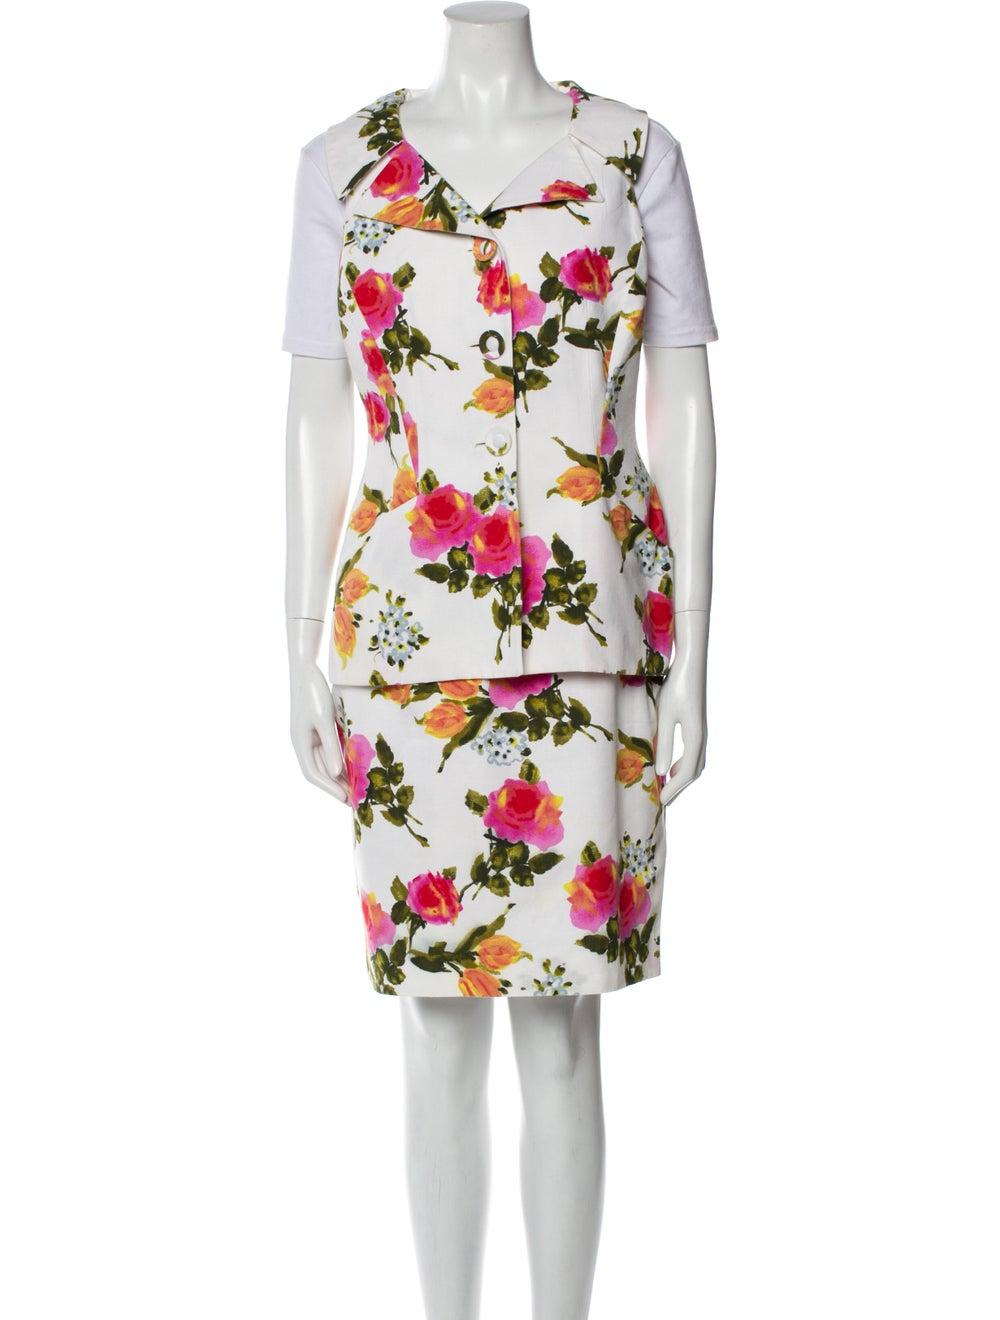 Christian Dior Vintage 1980's Skirt Set White - image 1